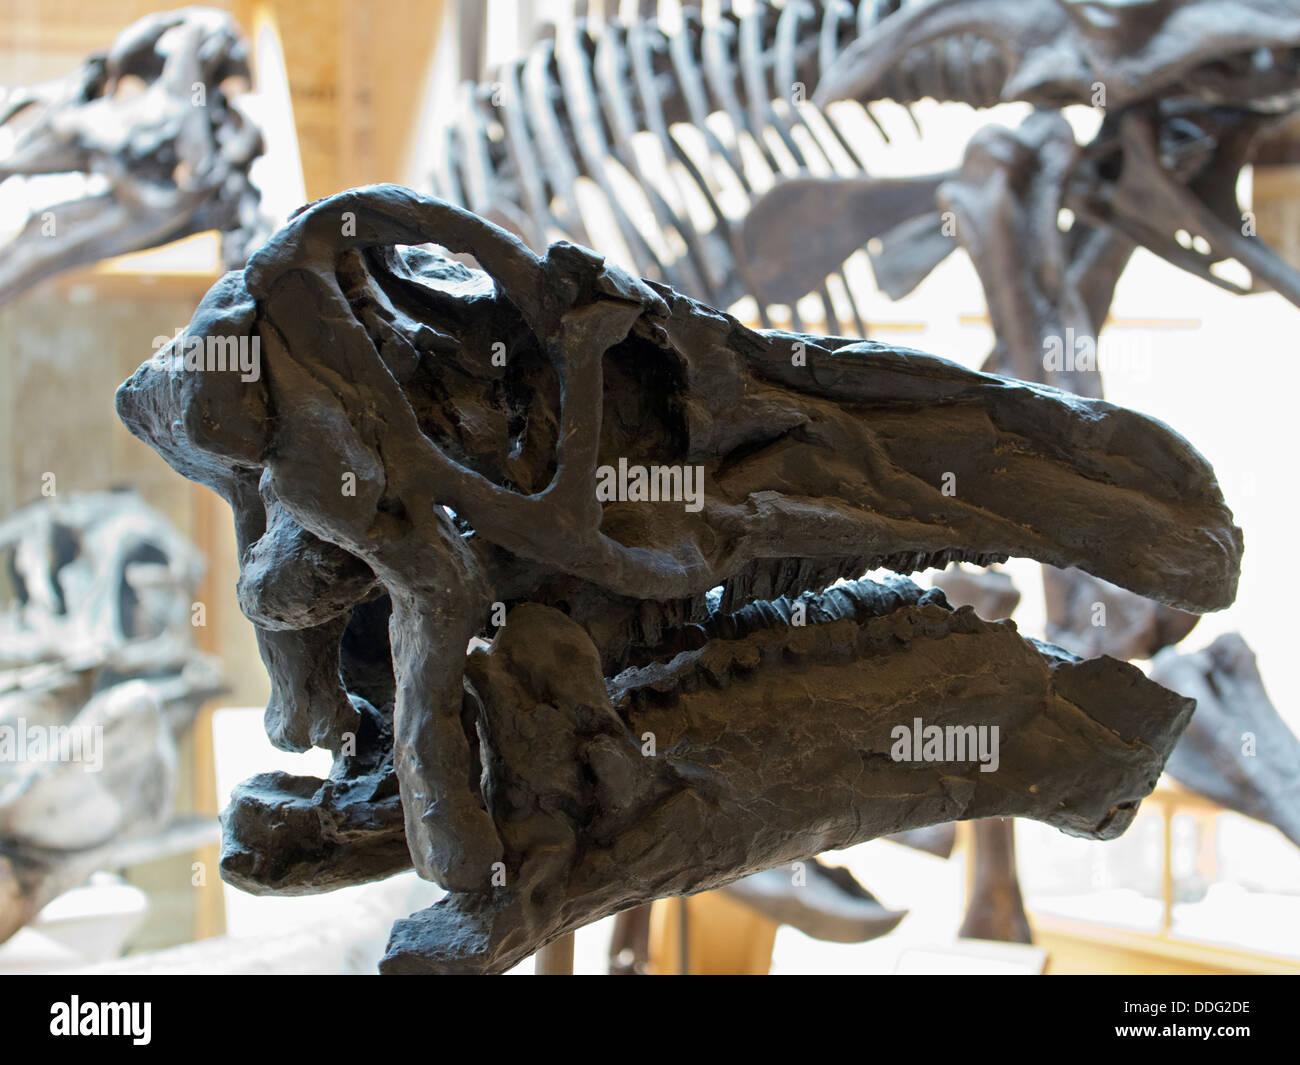 Dinosaur bones at the Pitt Rivers Natural History Museum, Oxford 5 - Stock Image